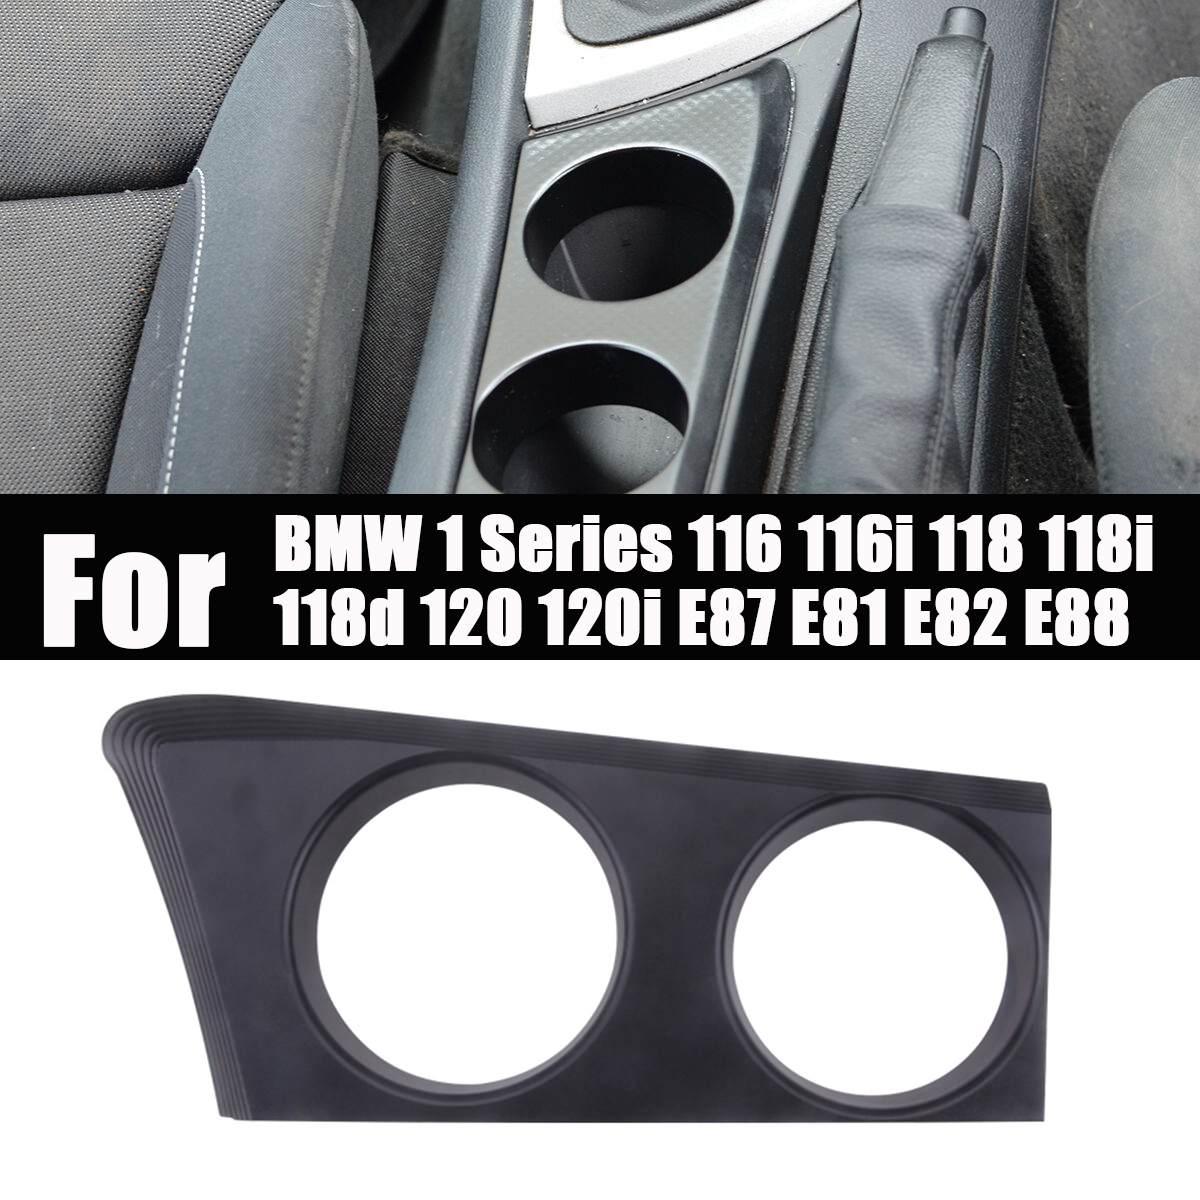 portátil, alumínio preto, acessórios para carro para